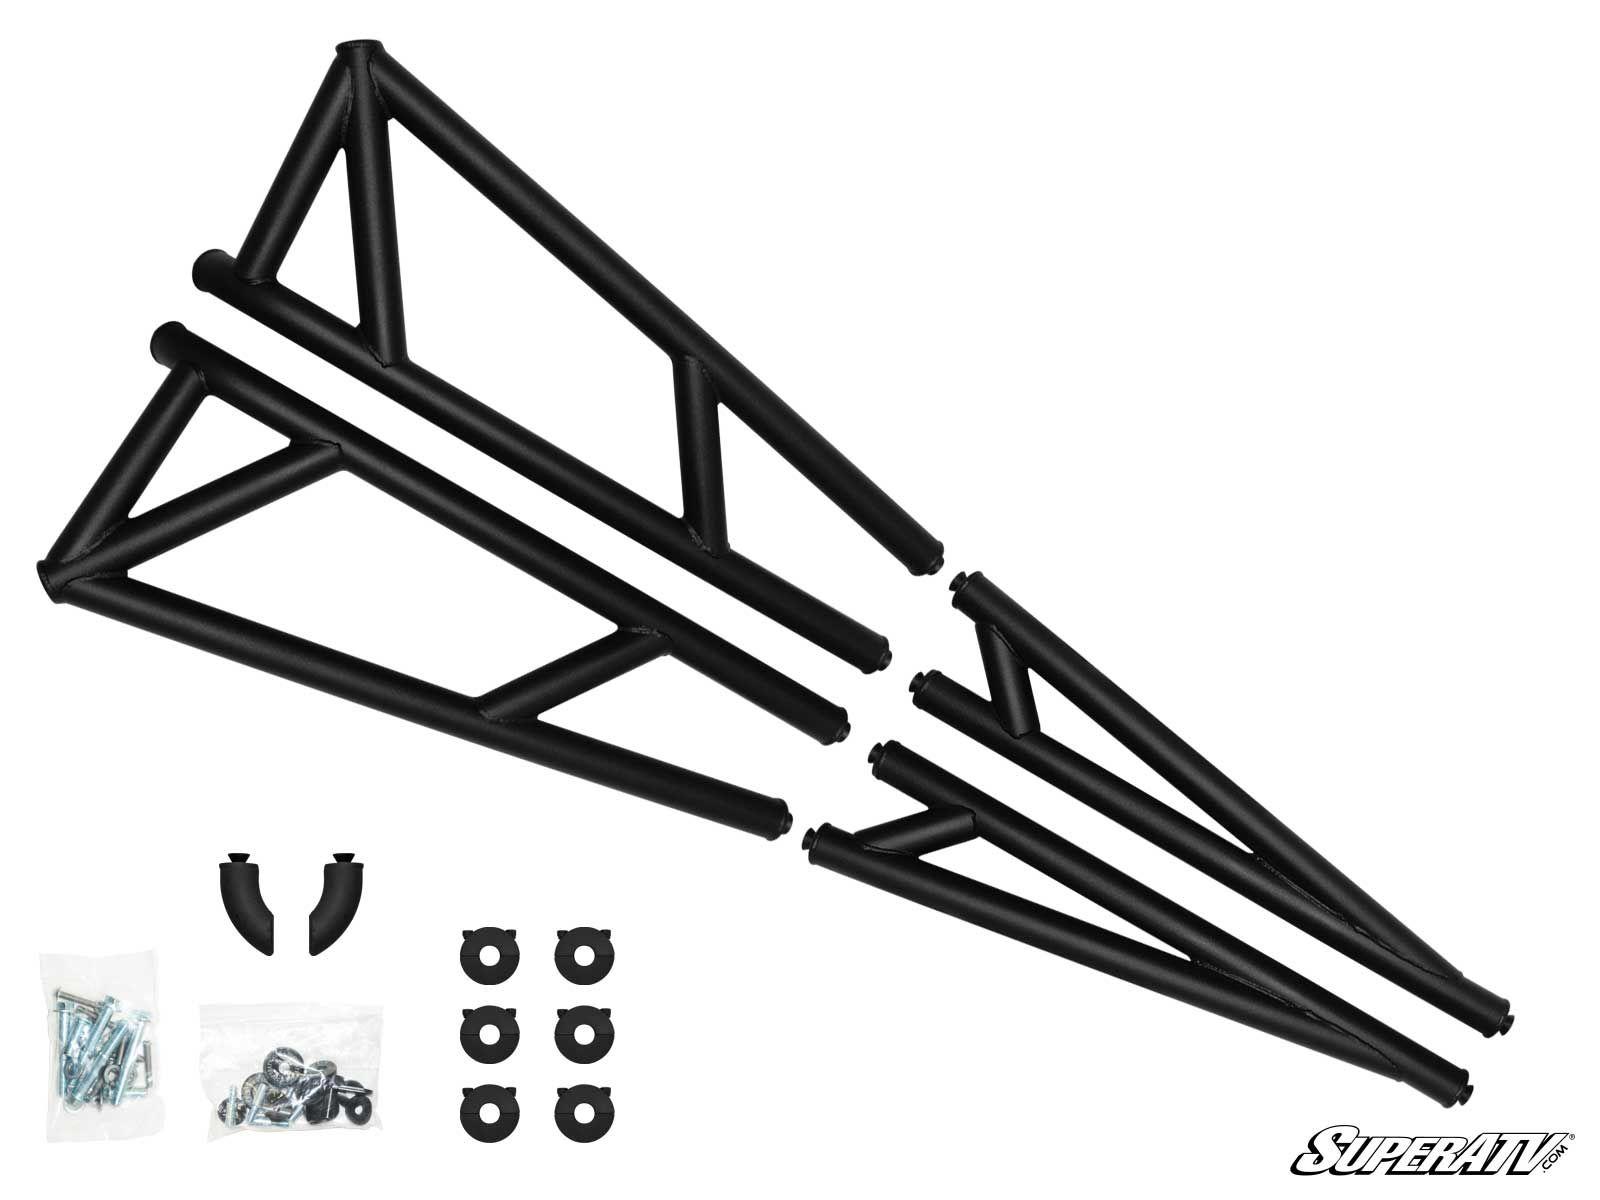 Super Atv Nerf Bars For The Polaris Rzr Xp 4 Rzr 4